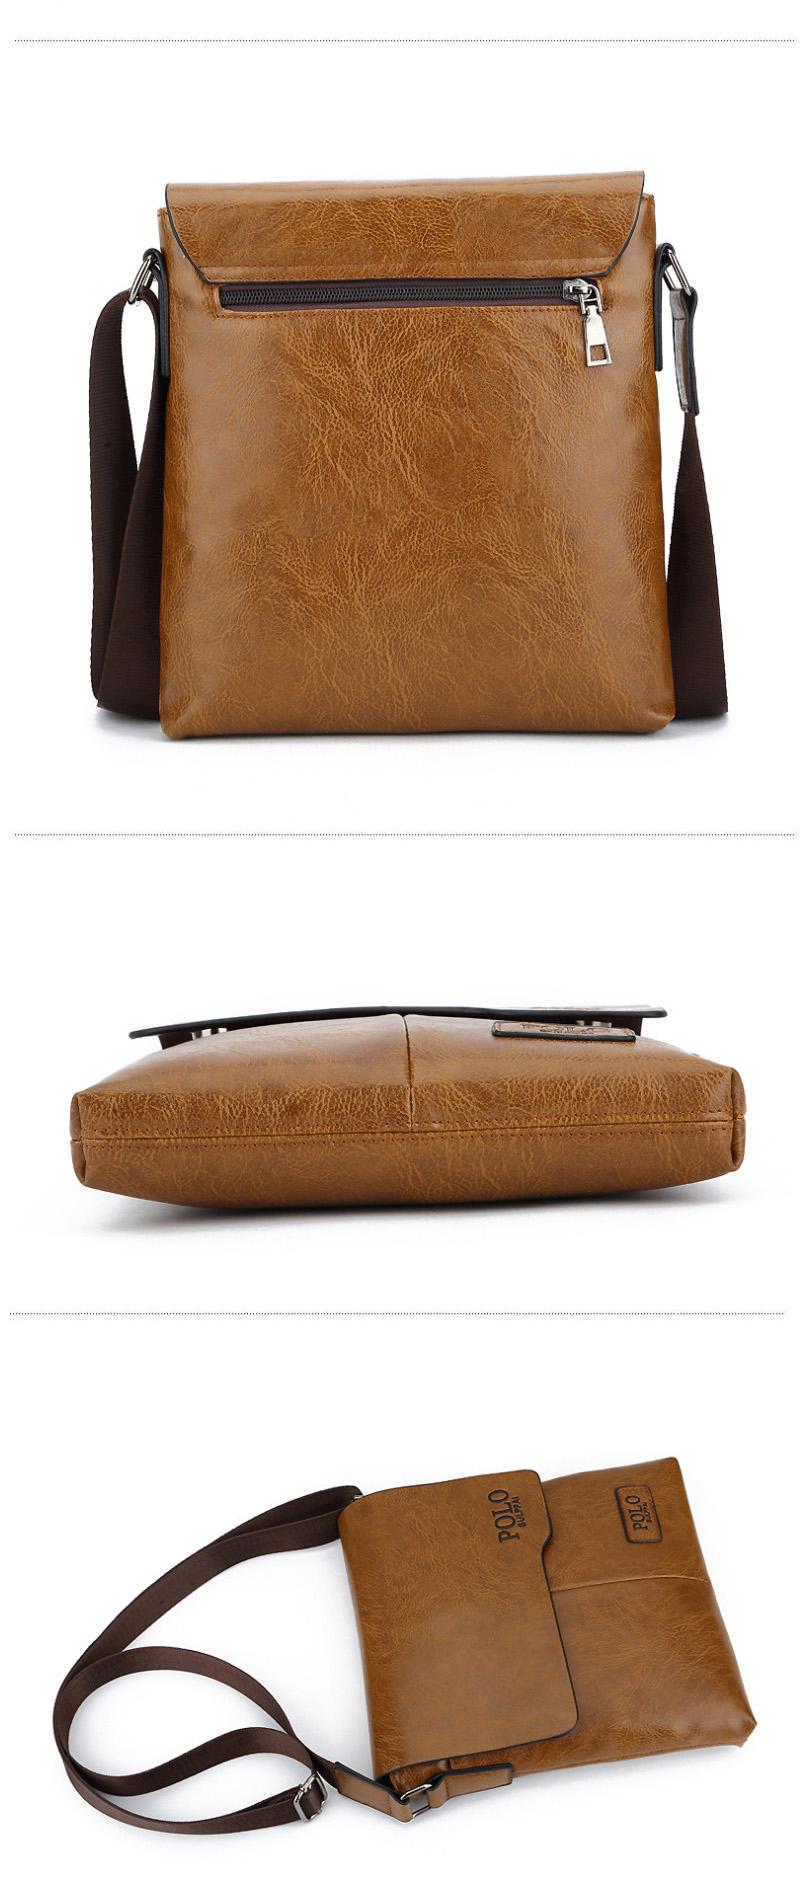 4852e5e8005b Designer POLO Bags Hot Sale Messenger Bag Men Leather High Quality  Crossbody Man Shoulder Bag. NB402 01 NB402 02 NB402 03 NB402 04 ...